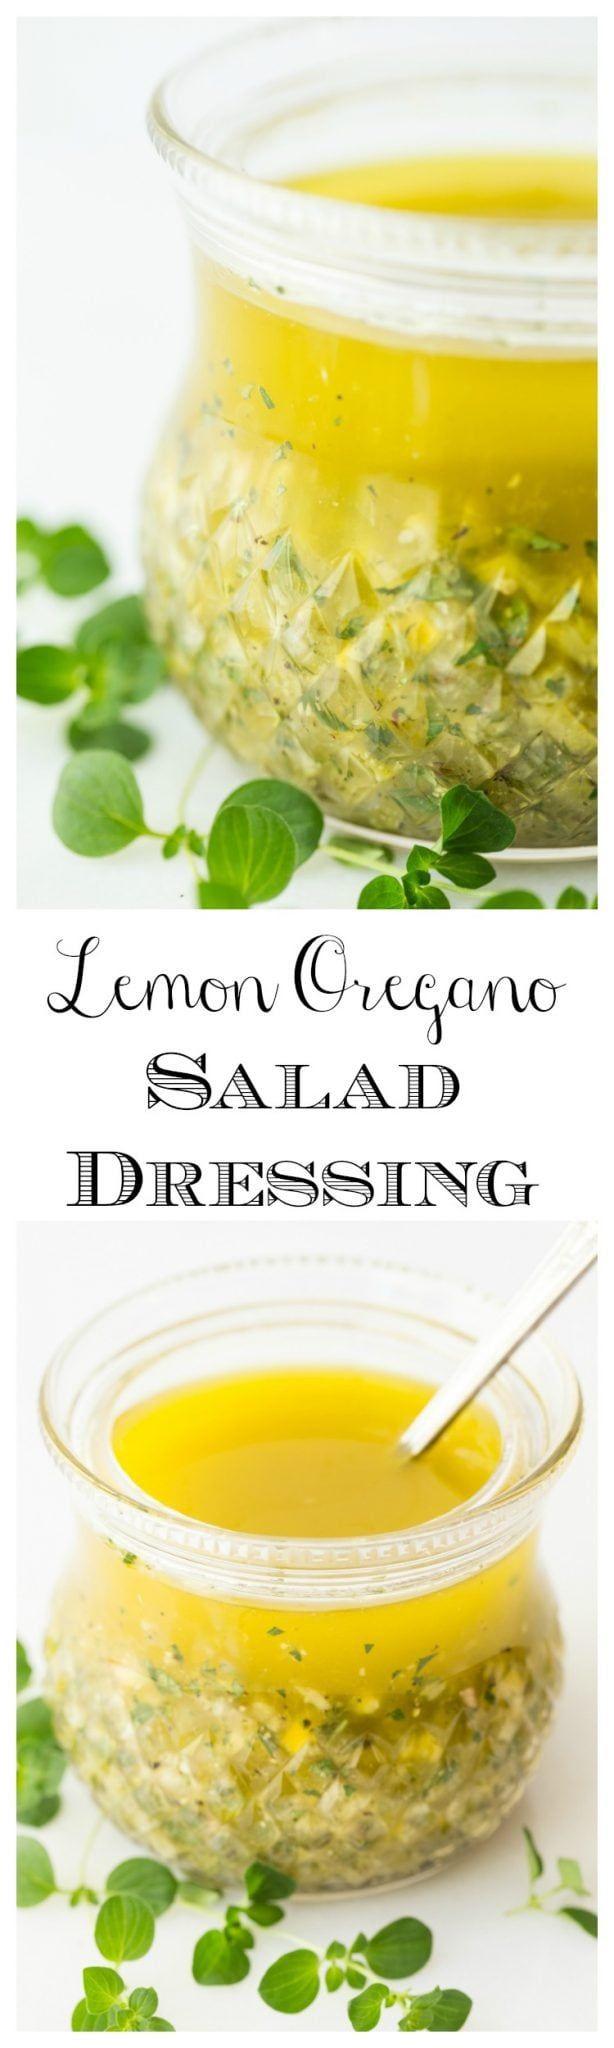 Zitronen-Oregano-Salatdressing – Zitronen-Oregano-Salatdressing – mit …   – salad dressings